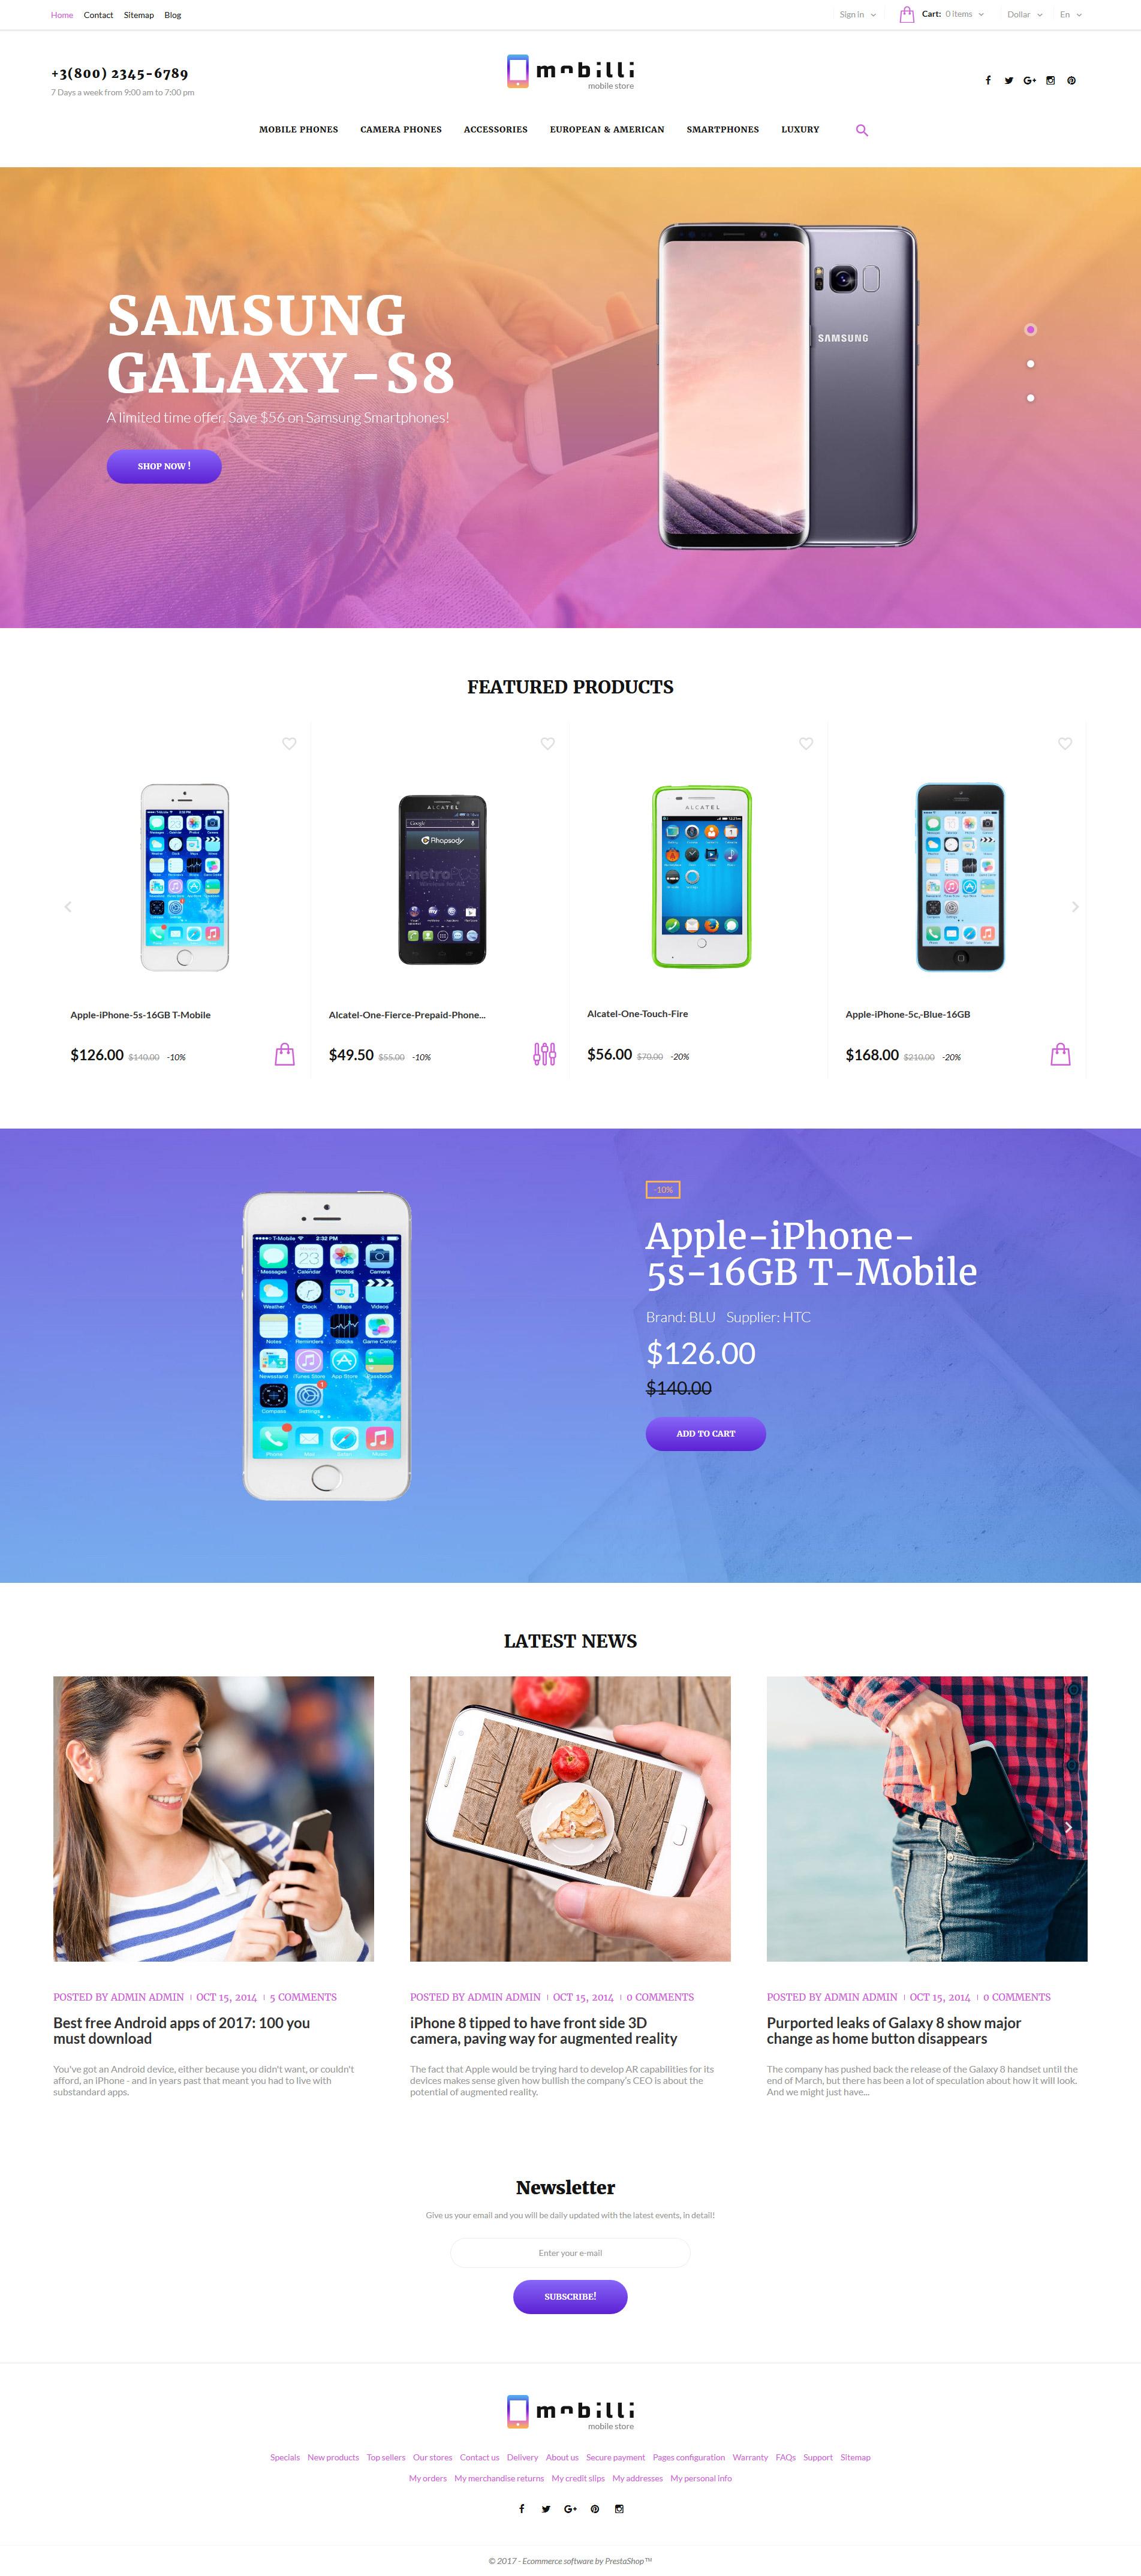 Mobilli - Mobile Phones & Accessories Tema PrestaShop №63335 - captura de tela